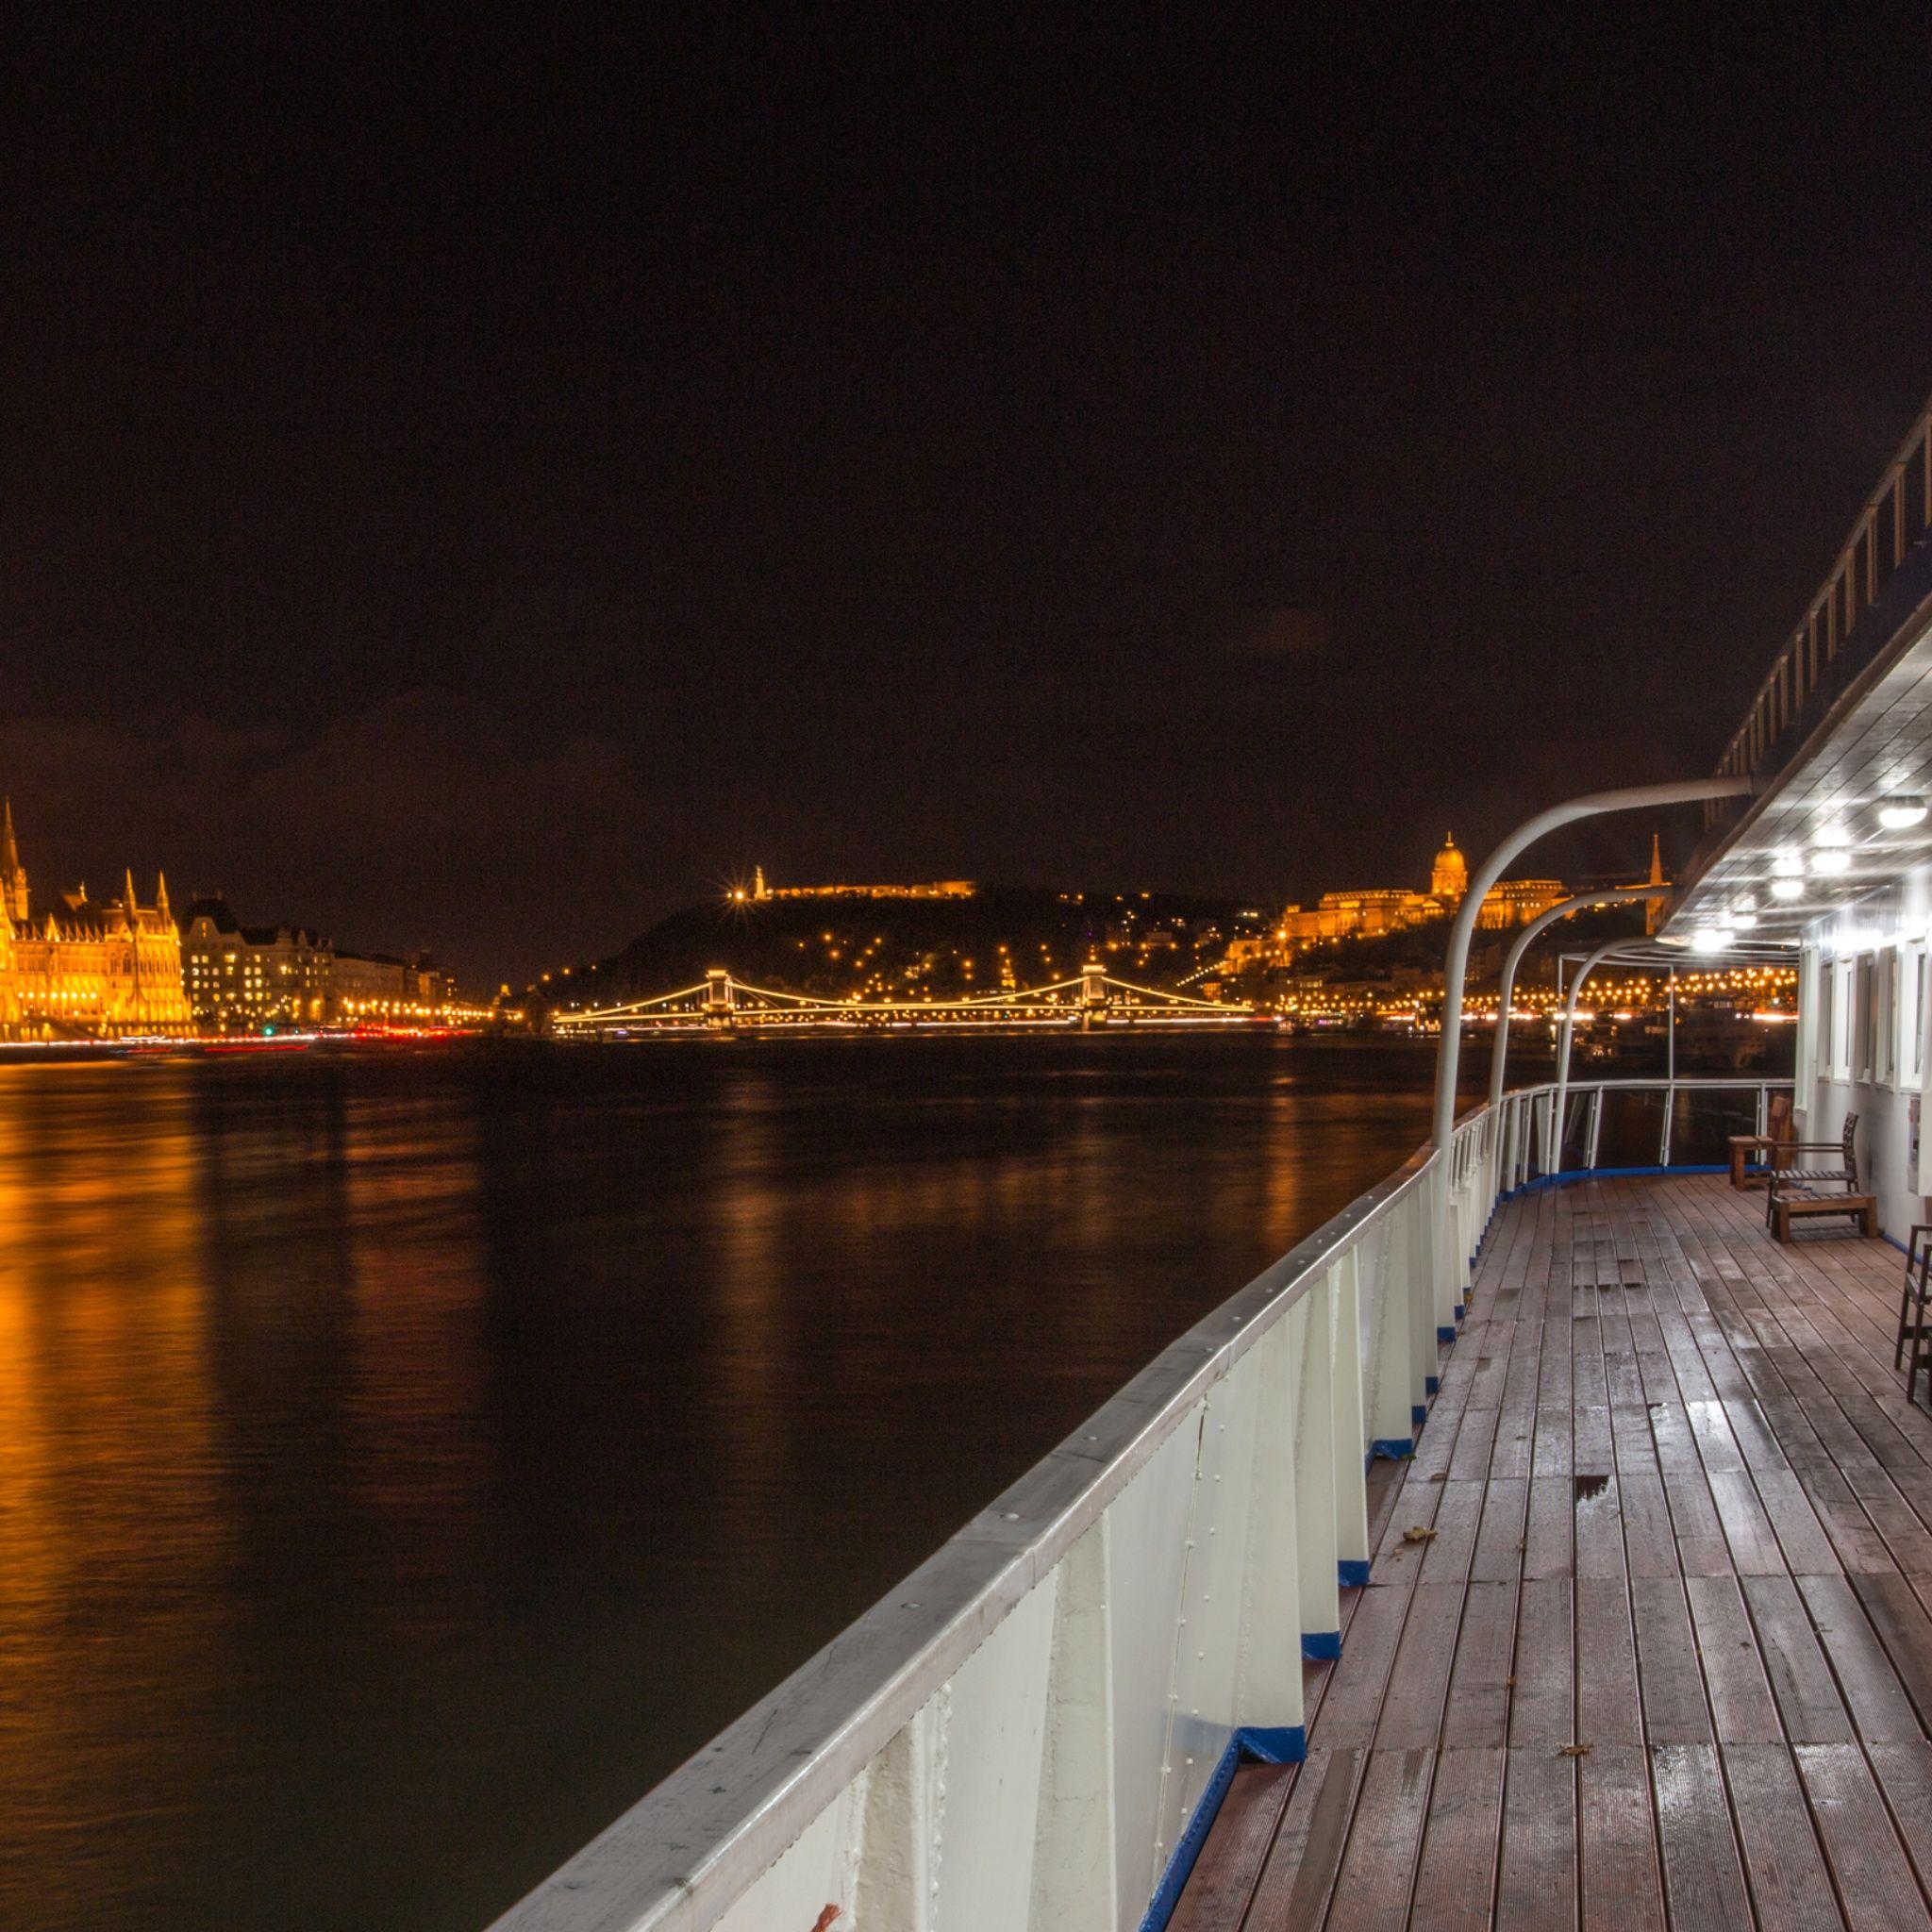 Grand Jules Boat Hotel Budapest - Lilla terem - Lilla teremkon